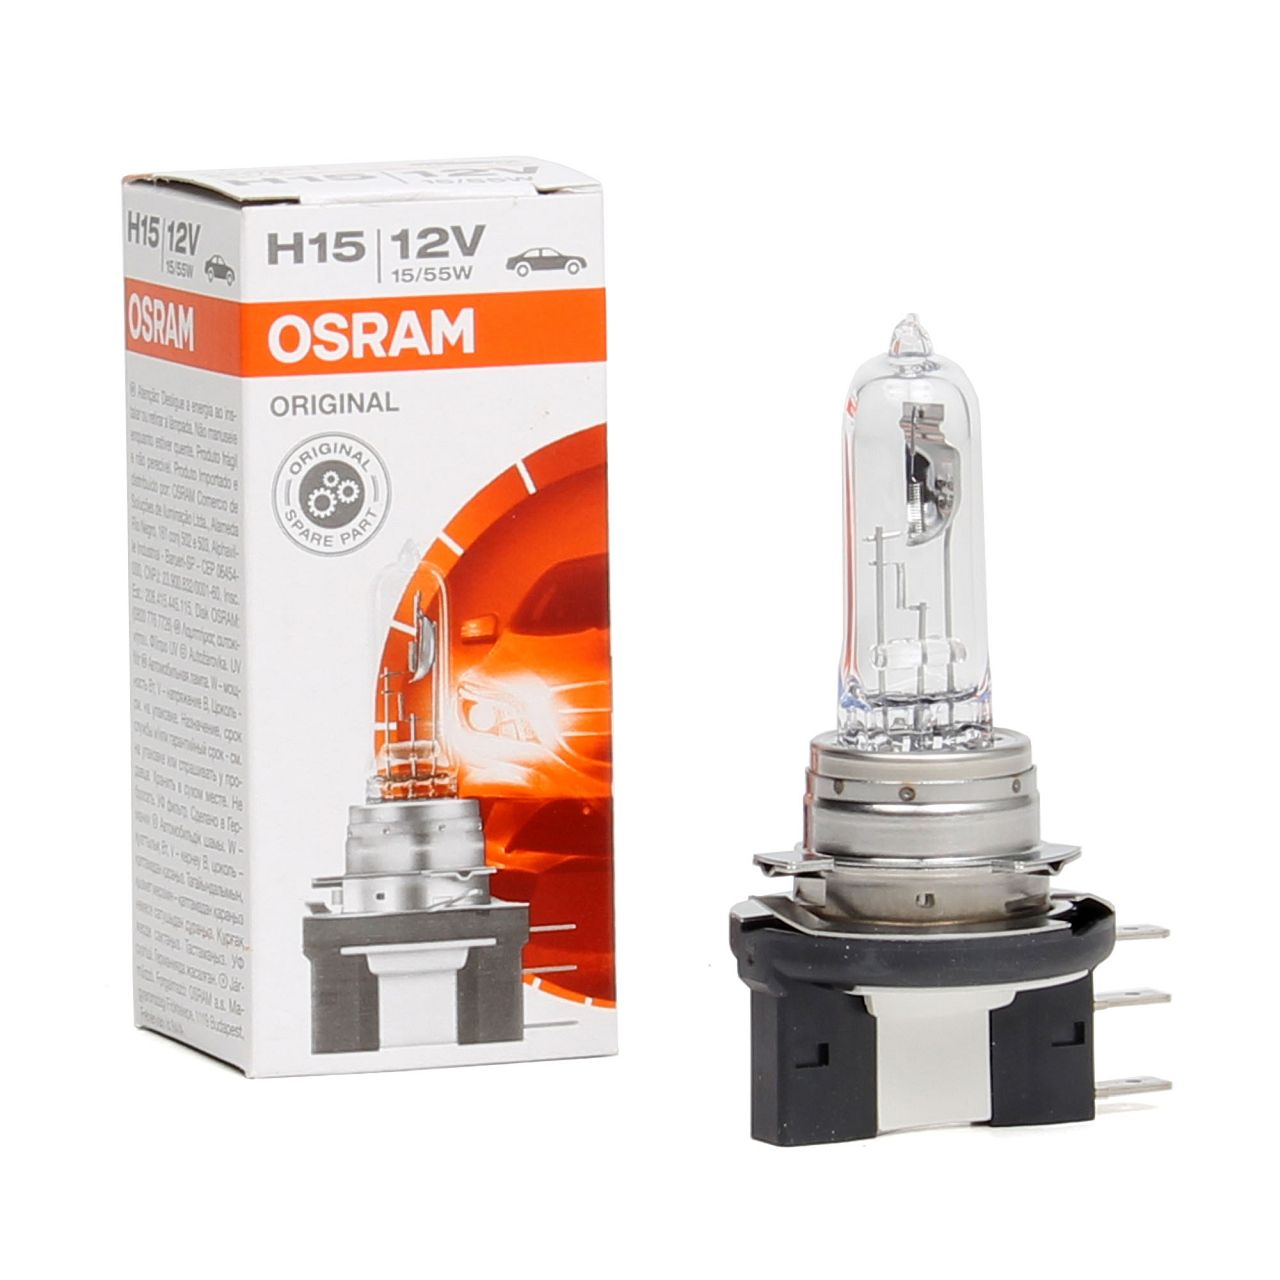 OSRAM Halogenlampe H15 ORIGINAL LINE 12V 55/15W PGJ23T-1 64176